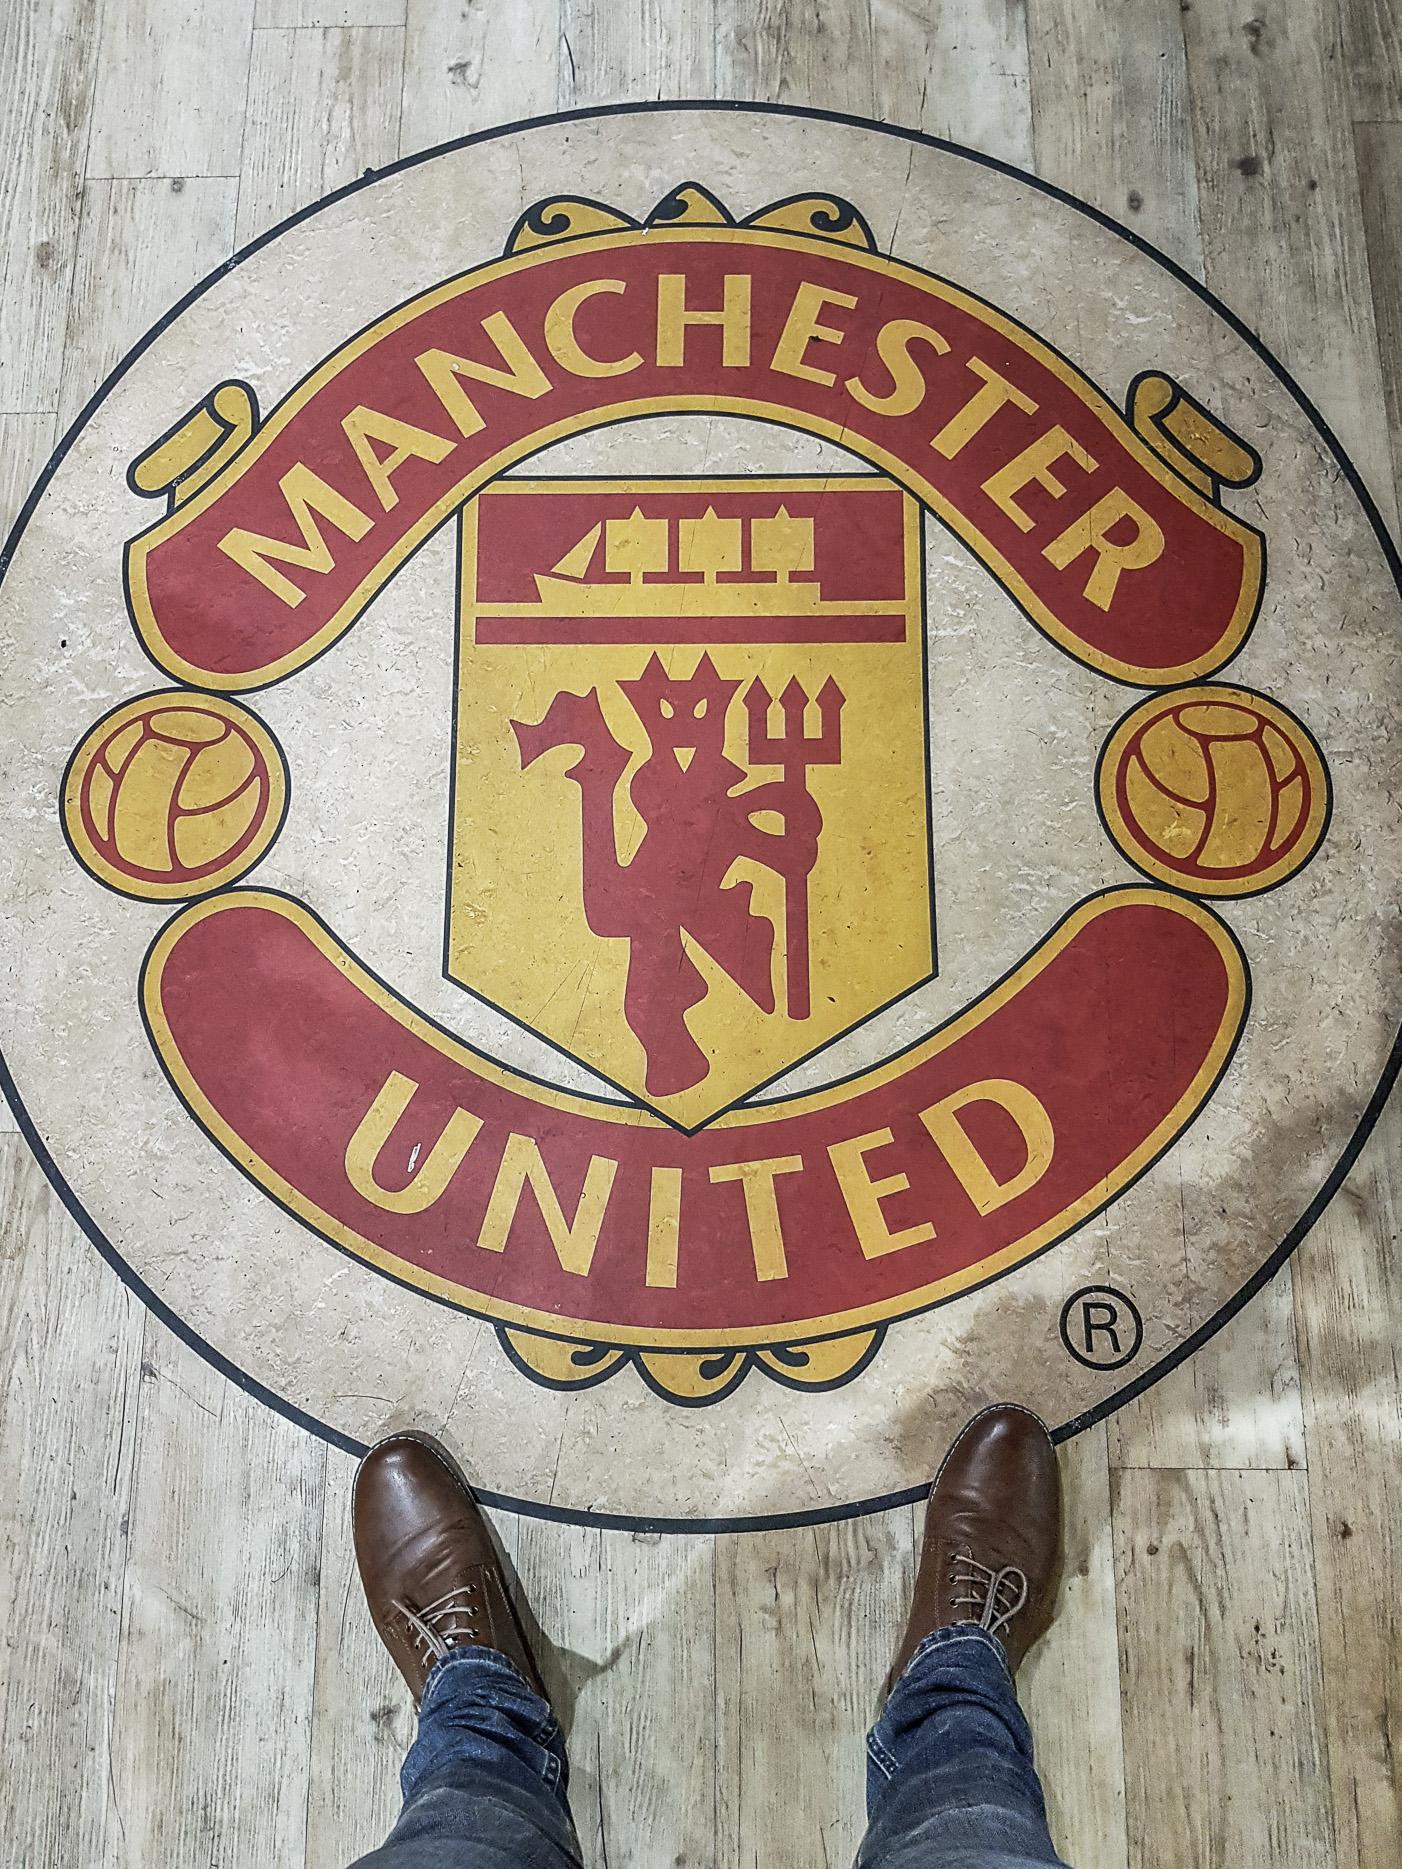 Att gå i Manchester Uniteds fotspår